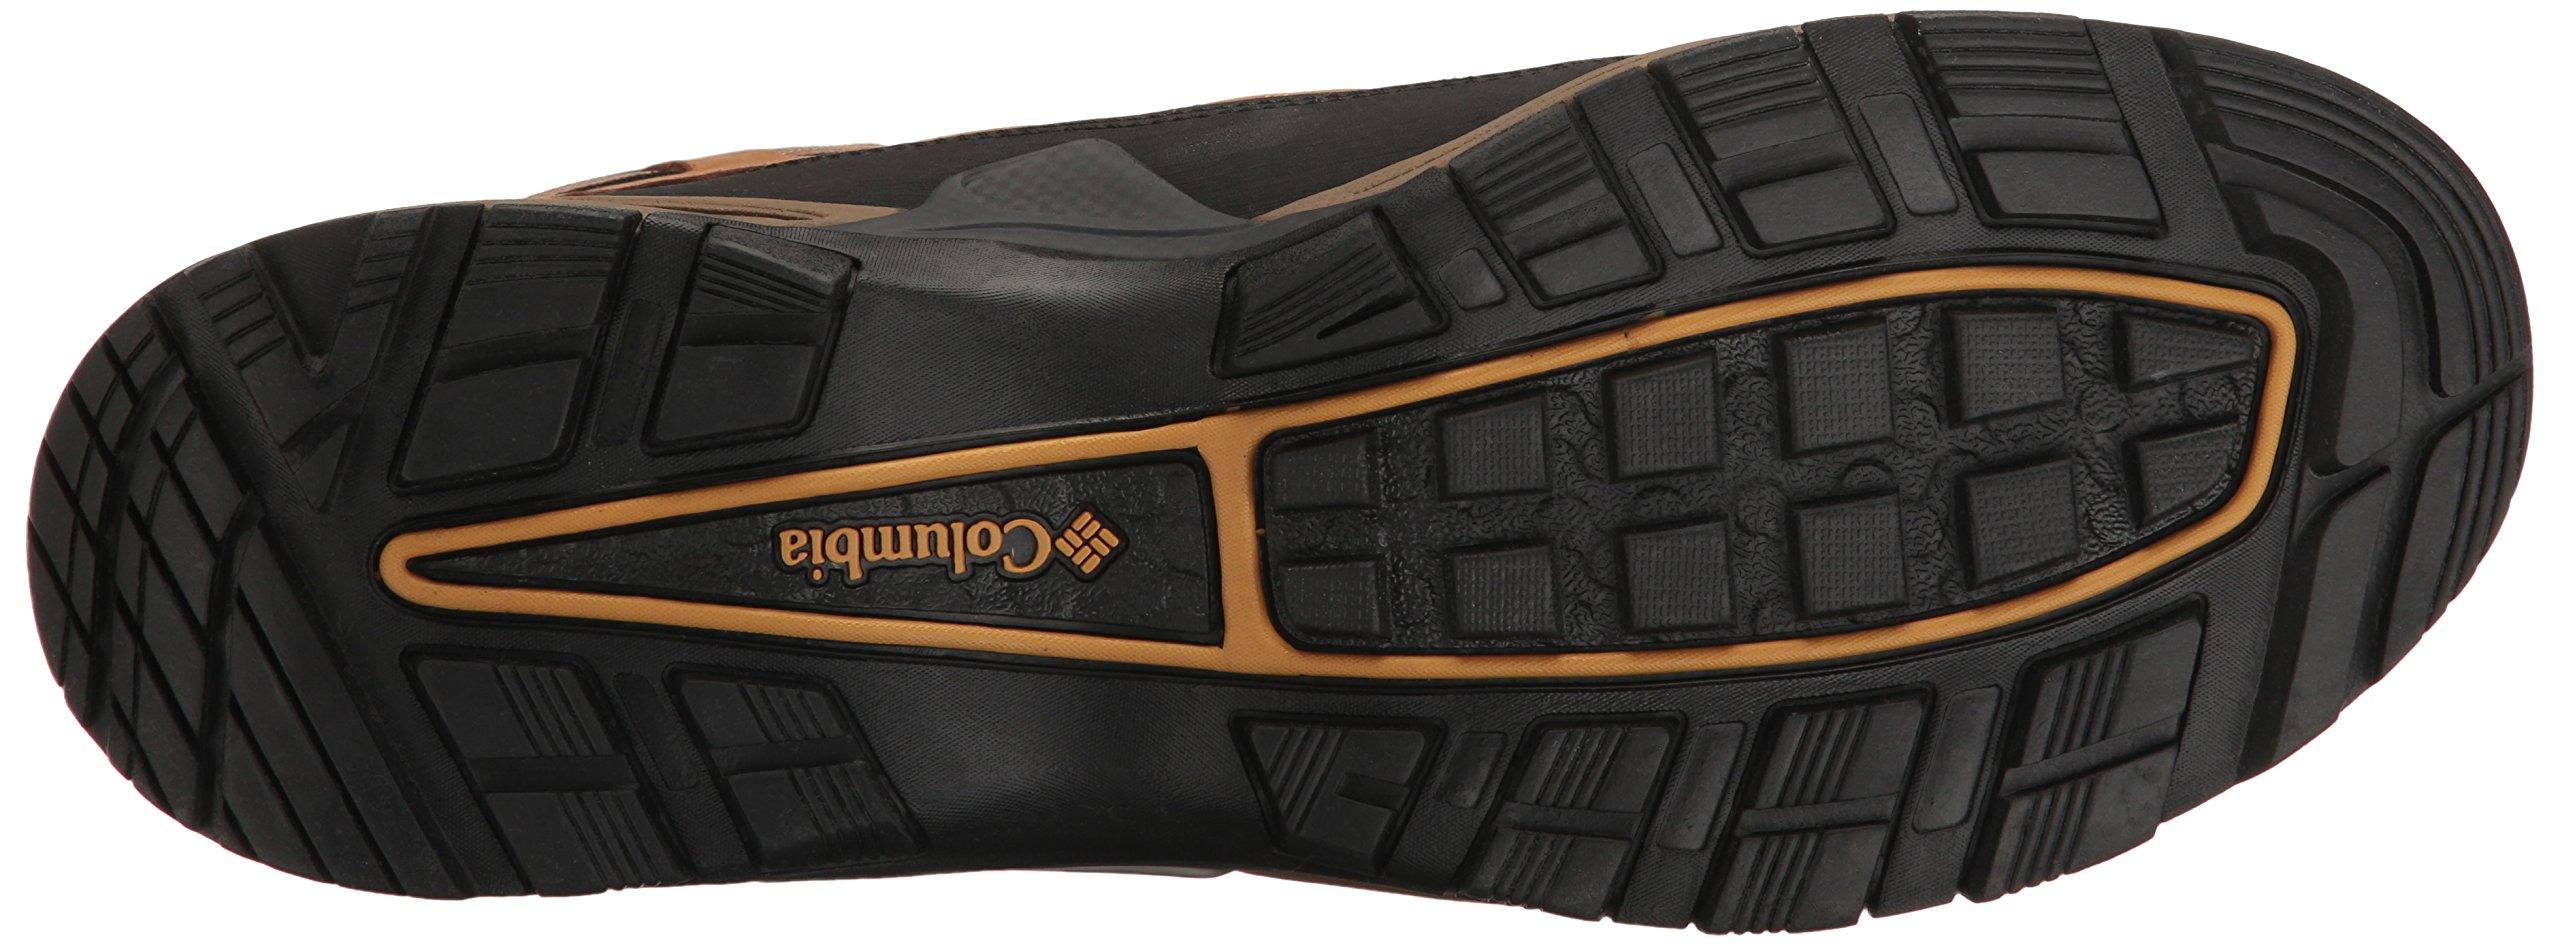 15a5fdce32d Columbia Mens Smith Rock Outdry Hiking Shoe Hawk Dark Banana 9.5 D US